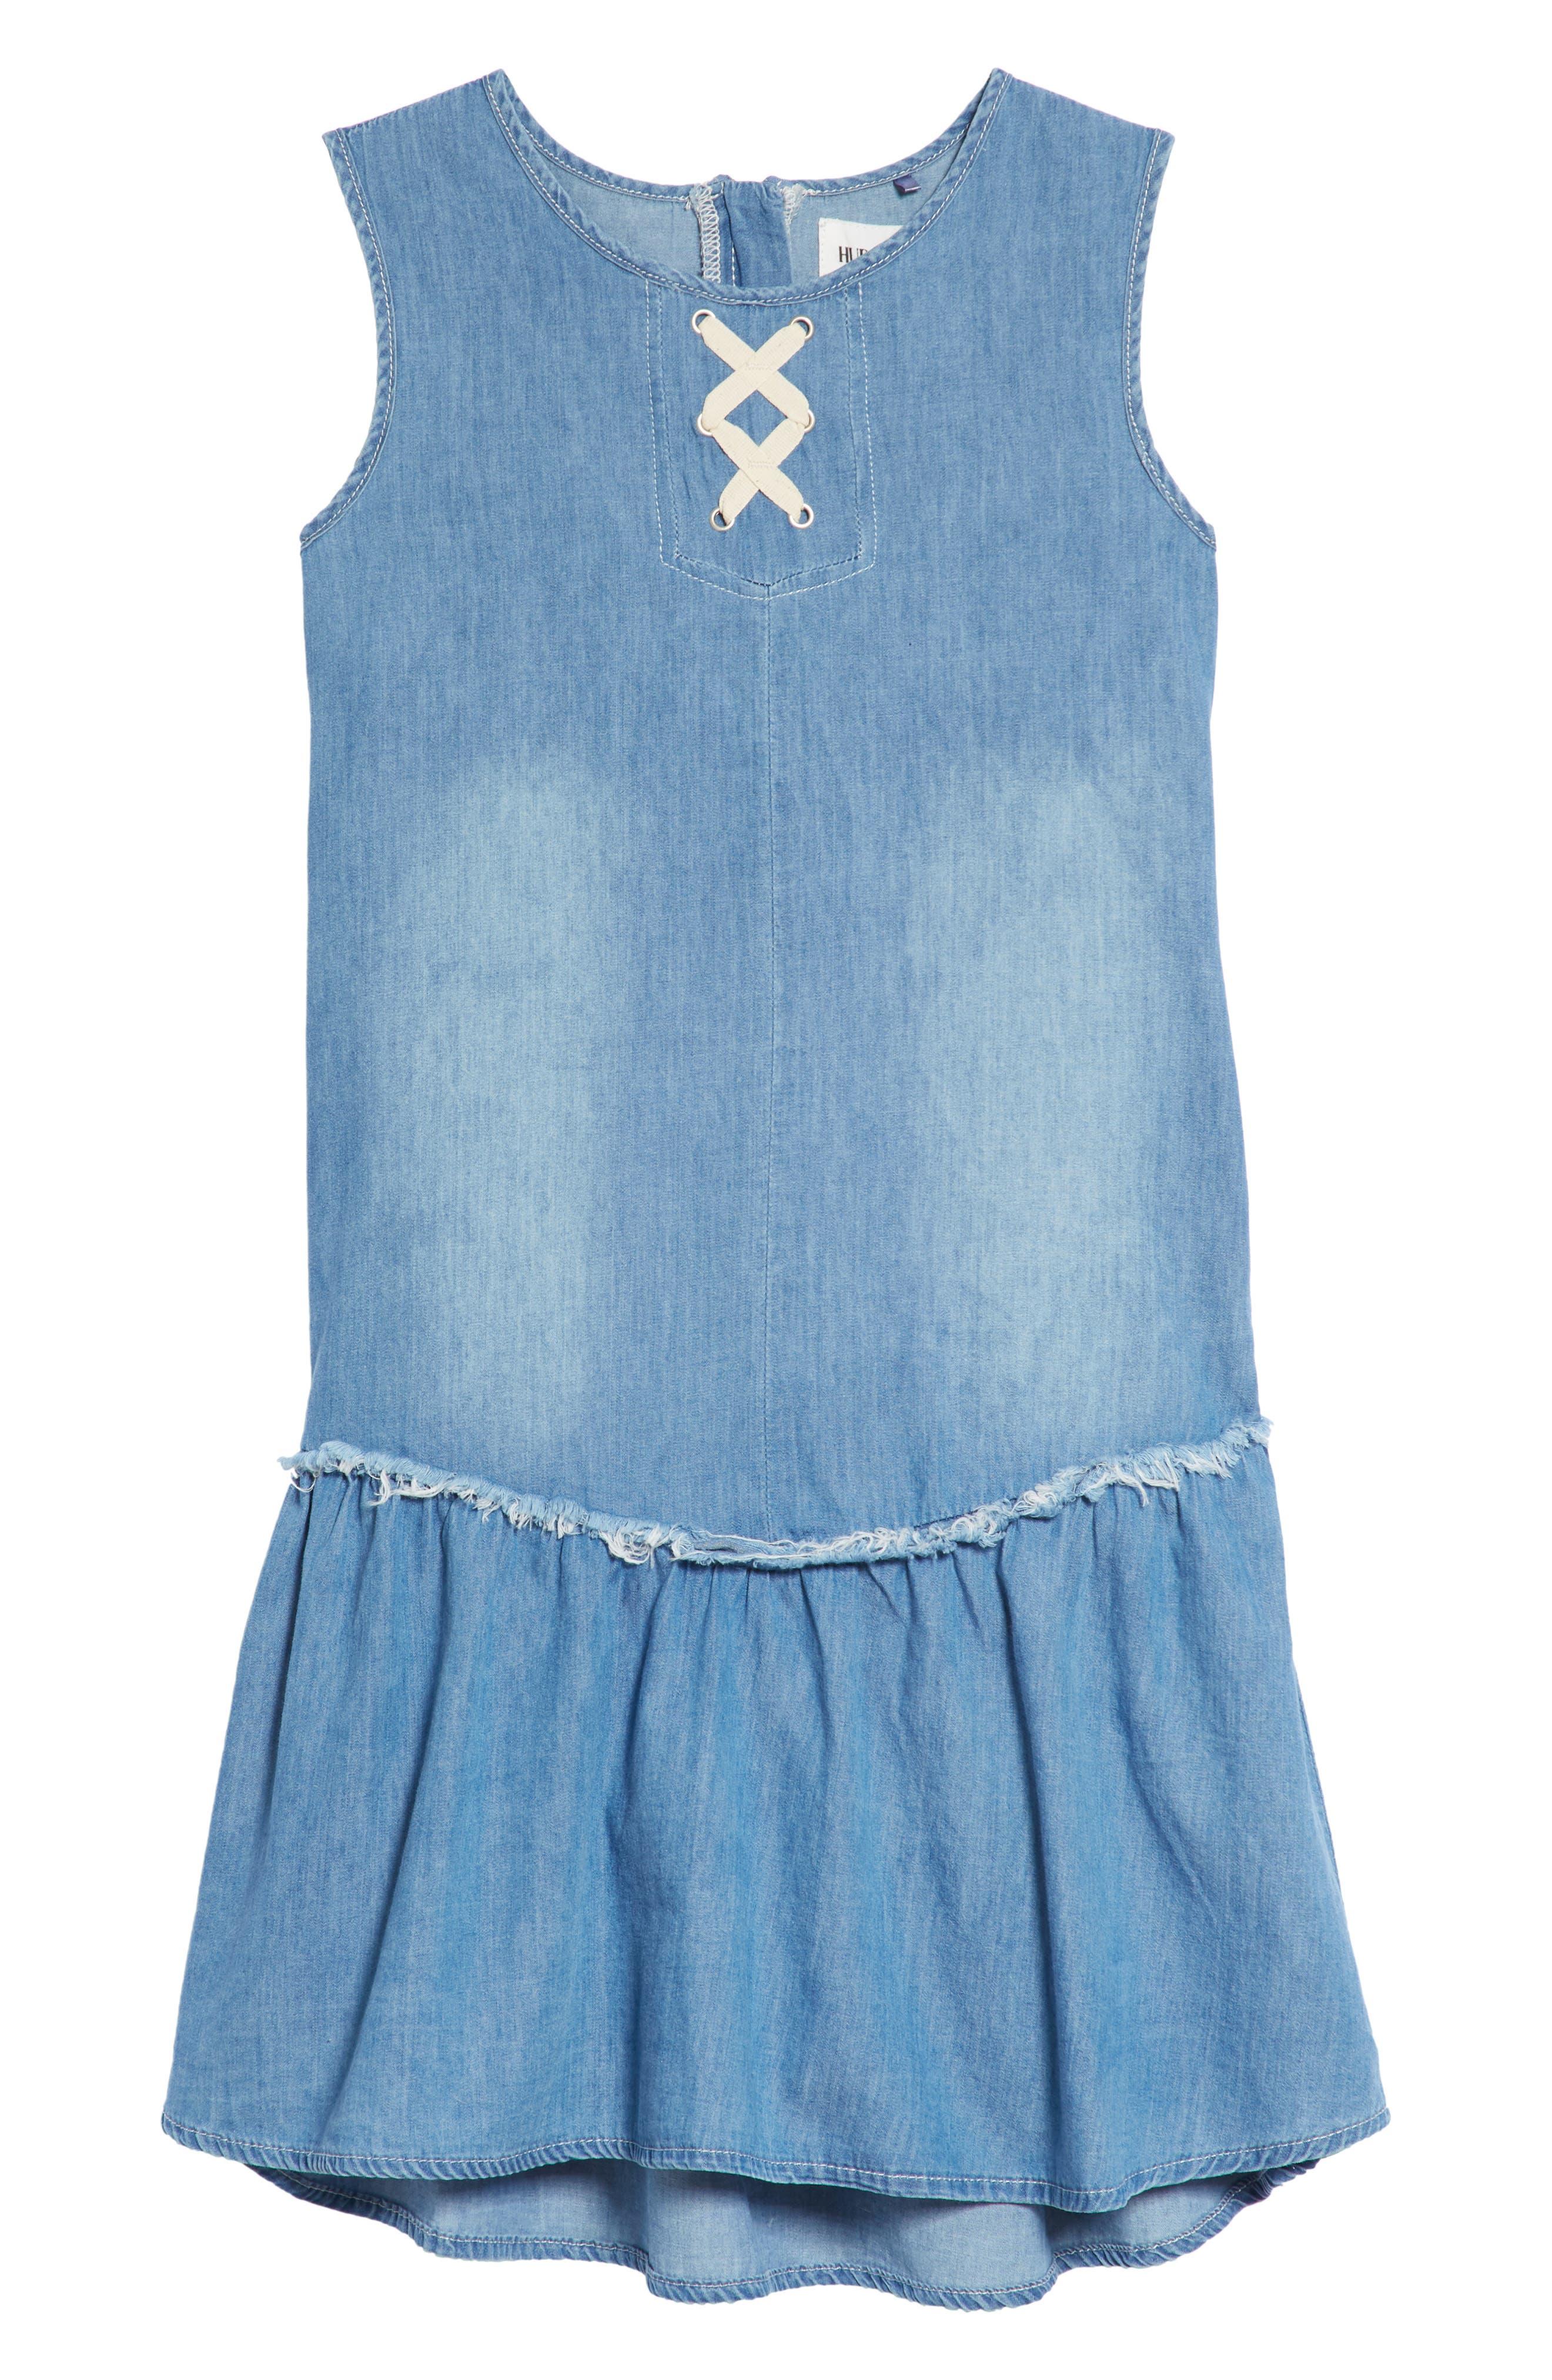 Lulu Lace-Up Chambray Dress,                             Main thumbnail 1, color,                             400